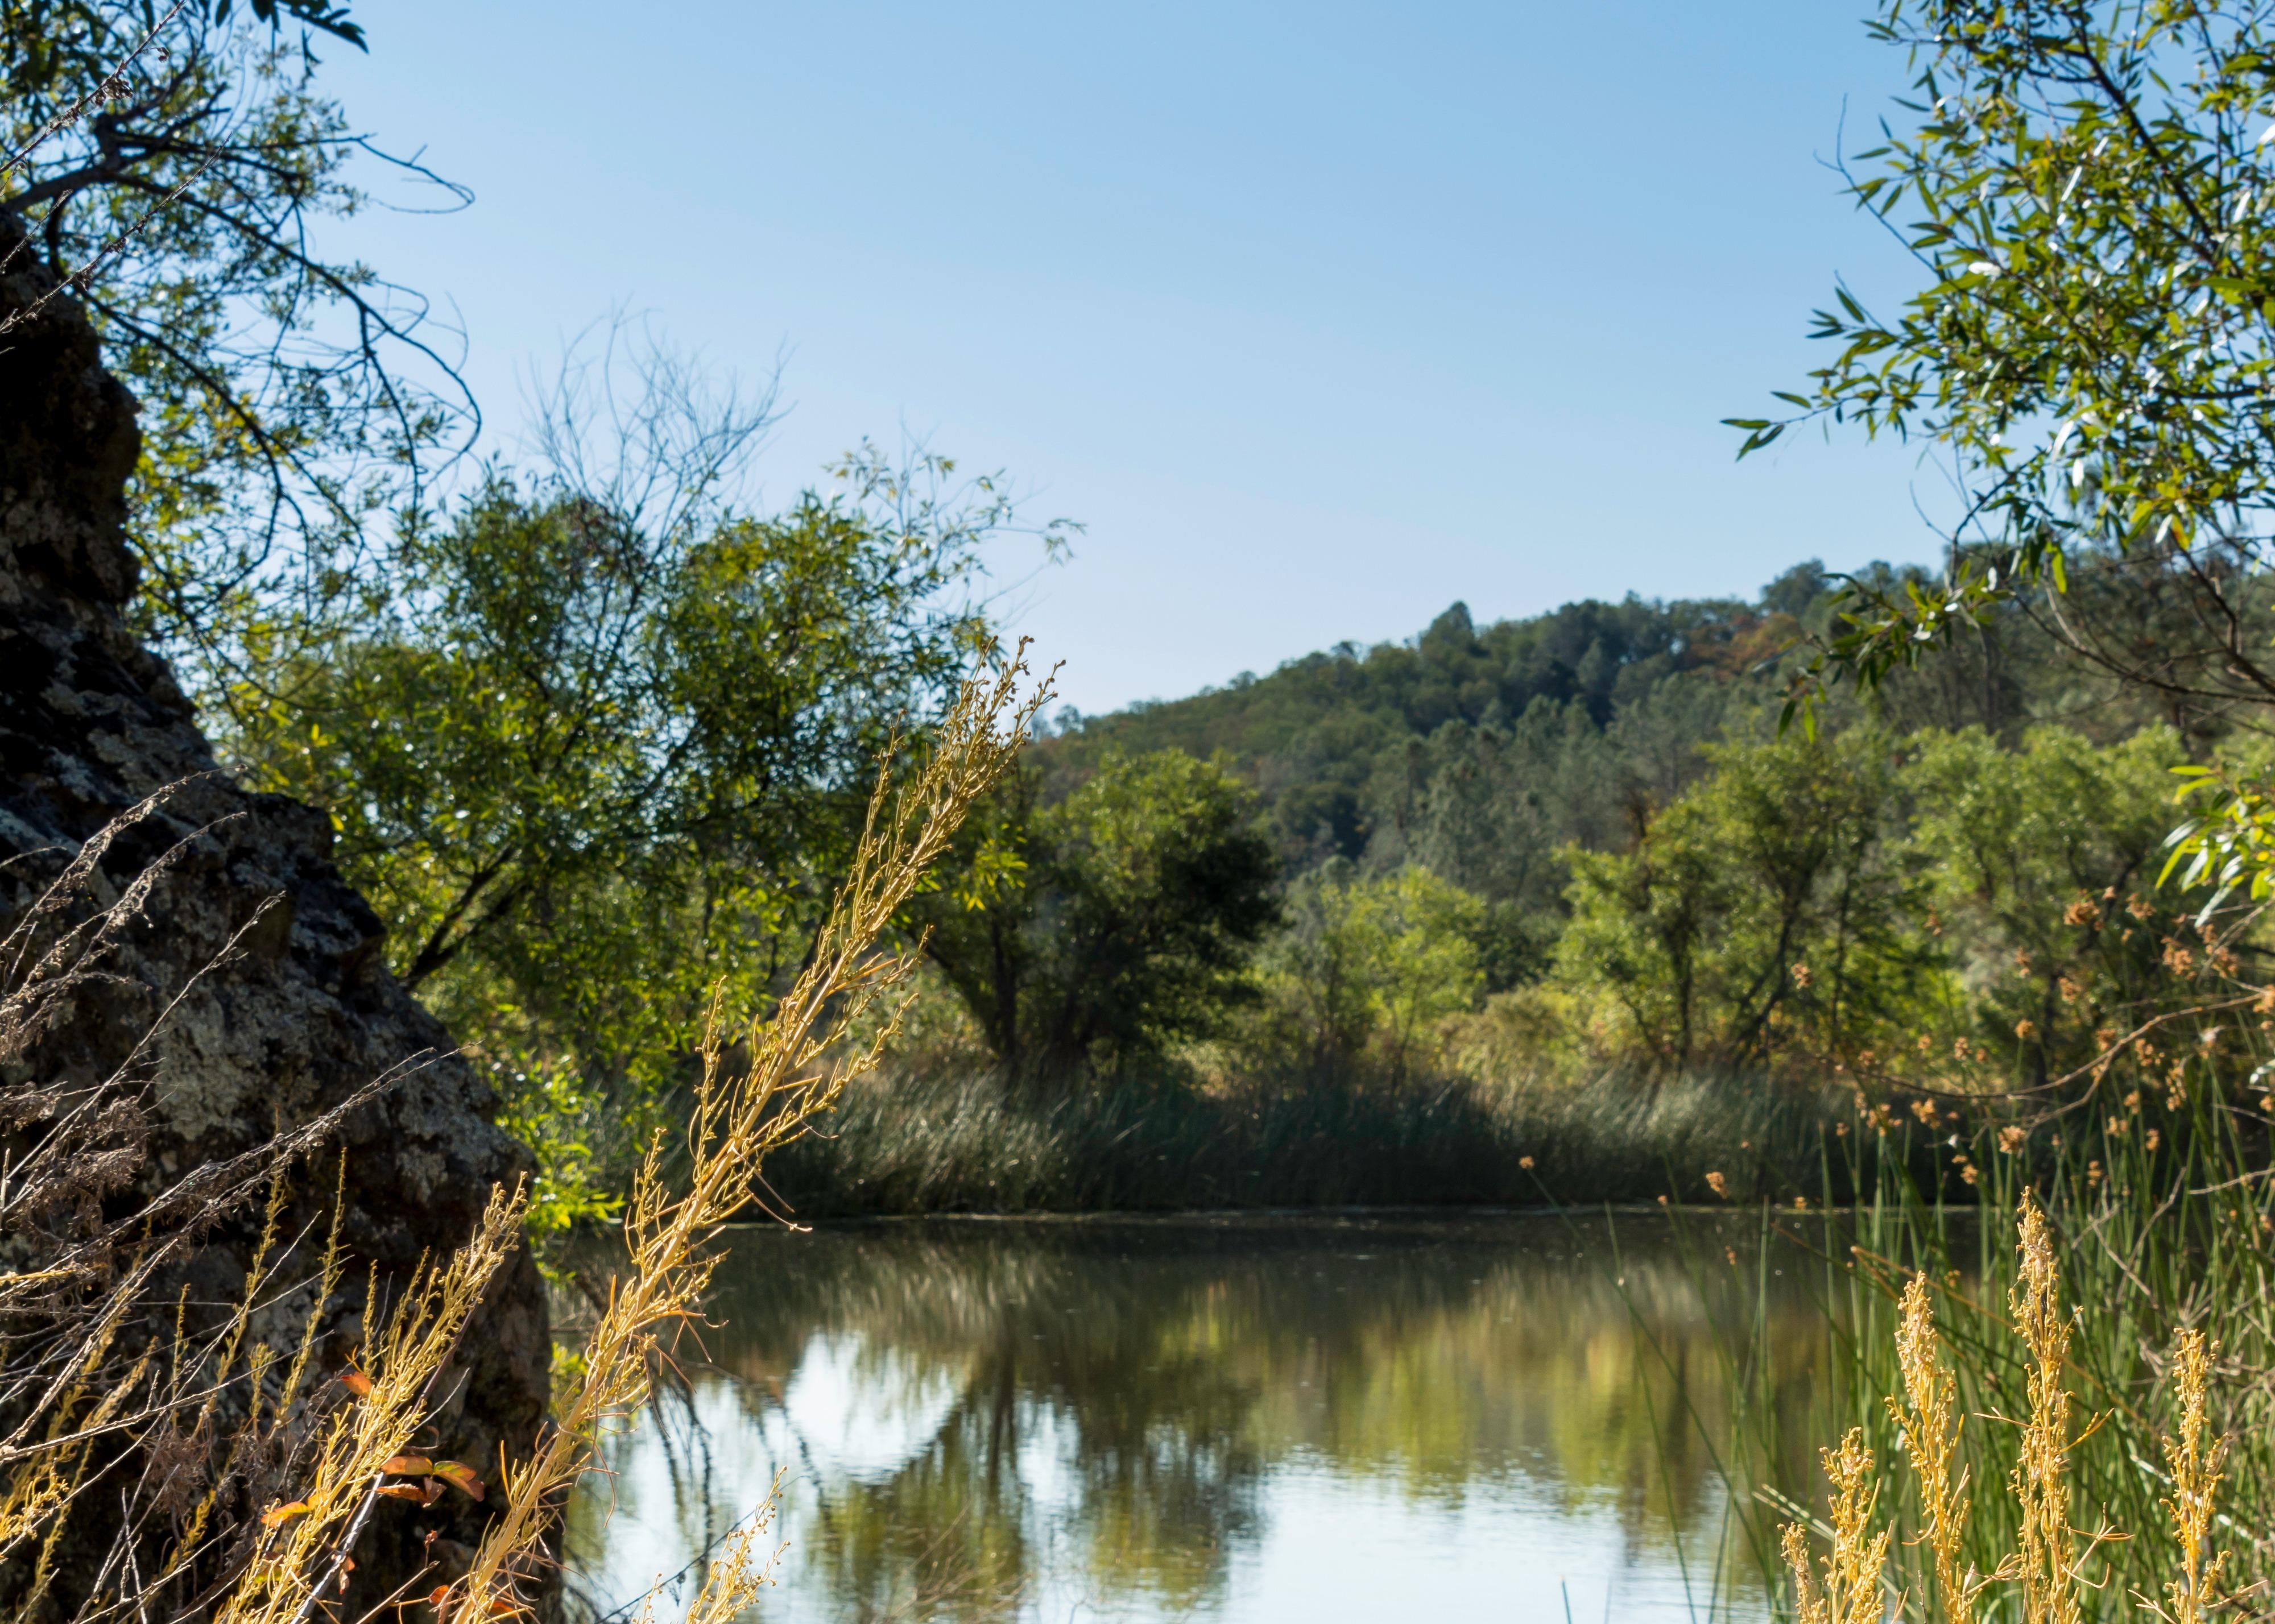 Little Uvas Creek